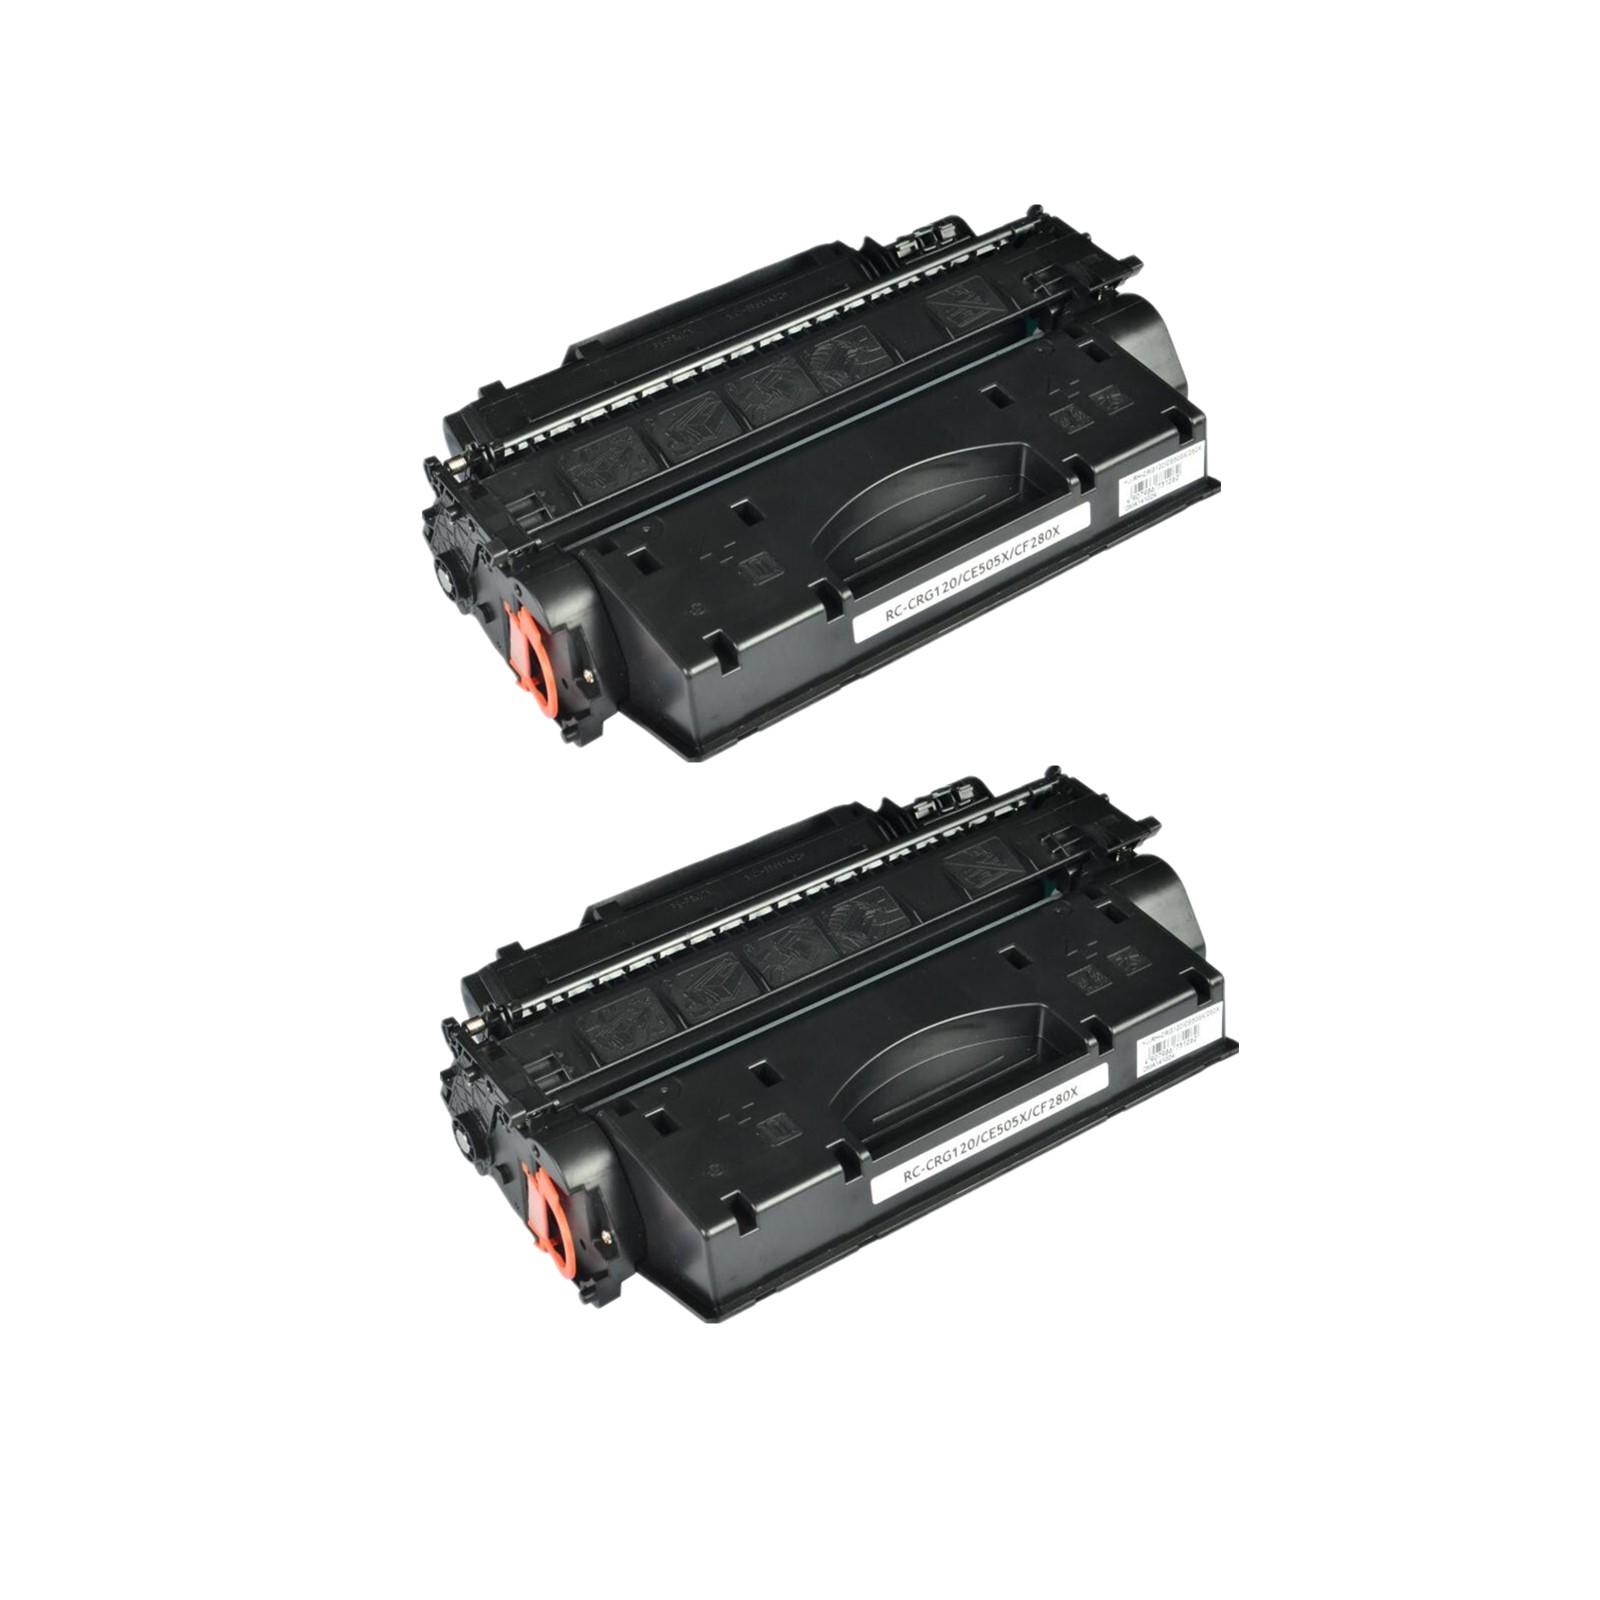 6PK CRG120 Toner Cartridge For Canon i-SENSYS MF6680 MF6780DW ImageClass D1120